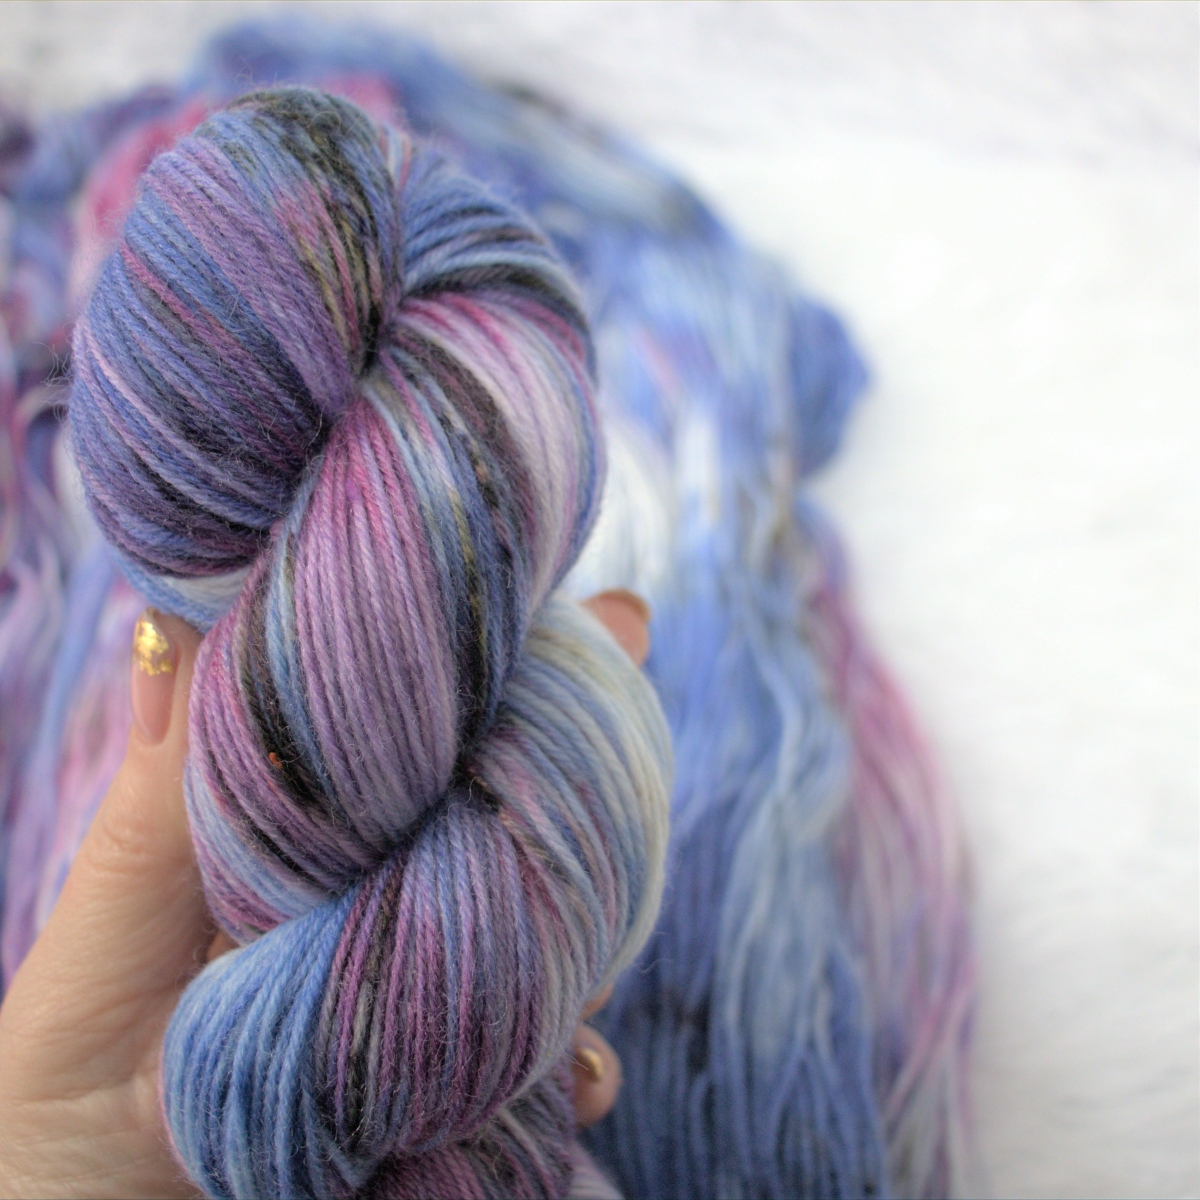 woodico.pro hand dyed yarn 043 1 1200x1200 - Hand dyed yarn / 043